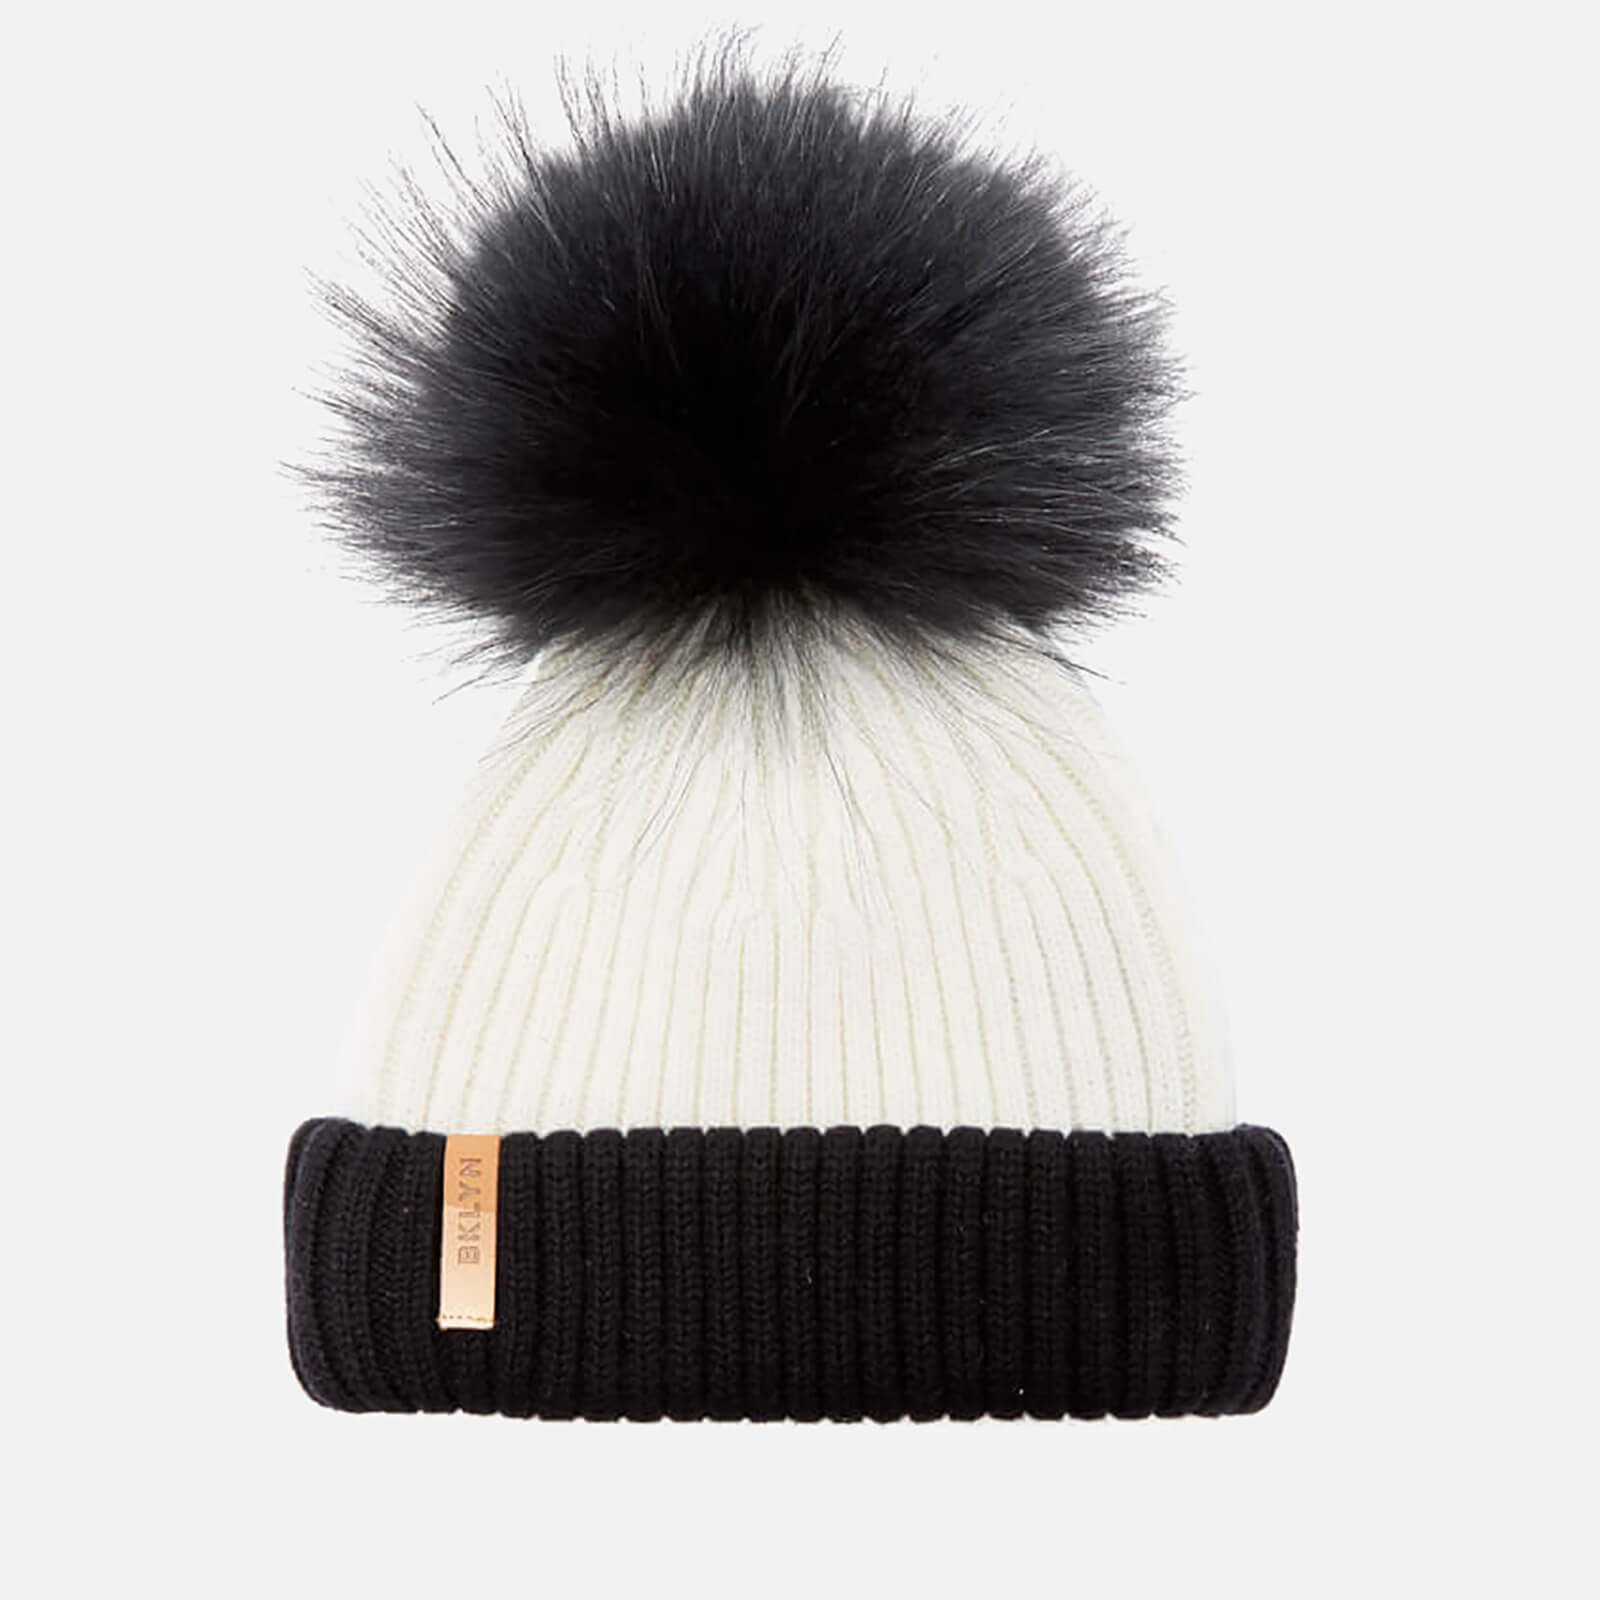 50d525da4 BKLYN Women's Merino Wool Hat with Black Pom Pom - White/Black